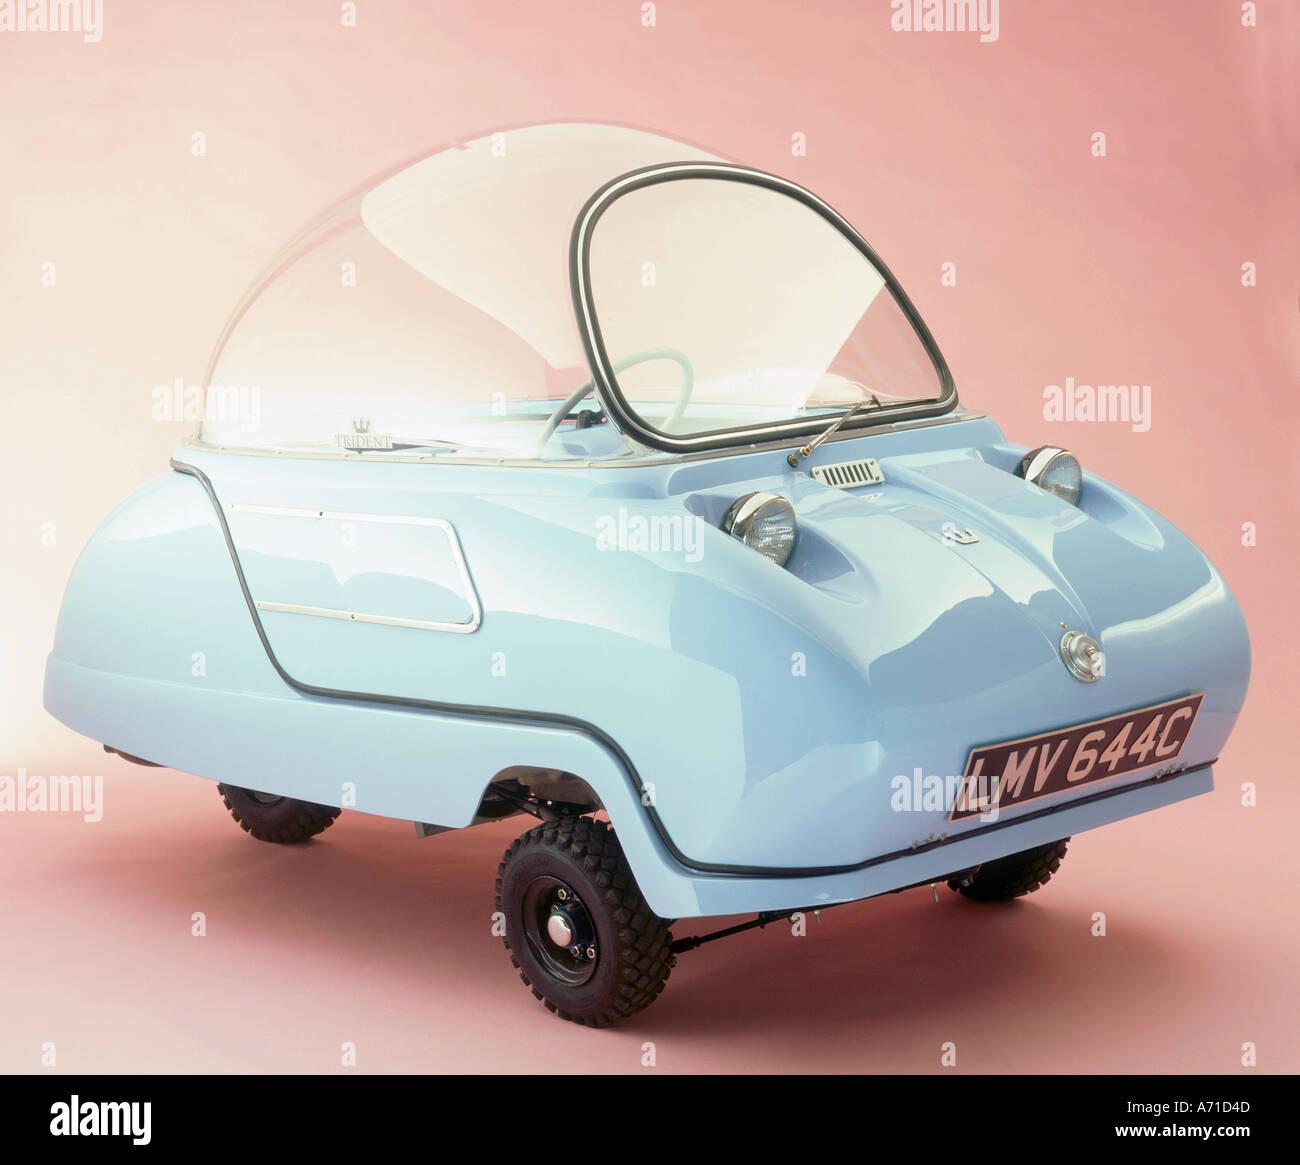 Car Stock Photos: 1960s Bubble Car Stock Photos & 1960s Bubble Car Stock